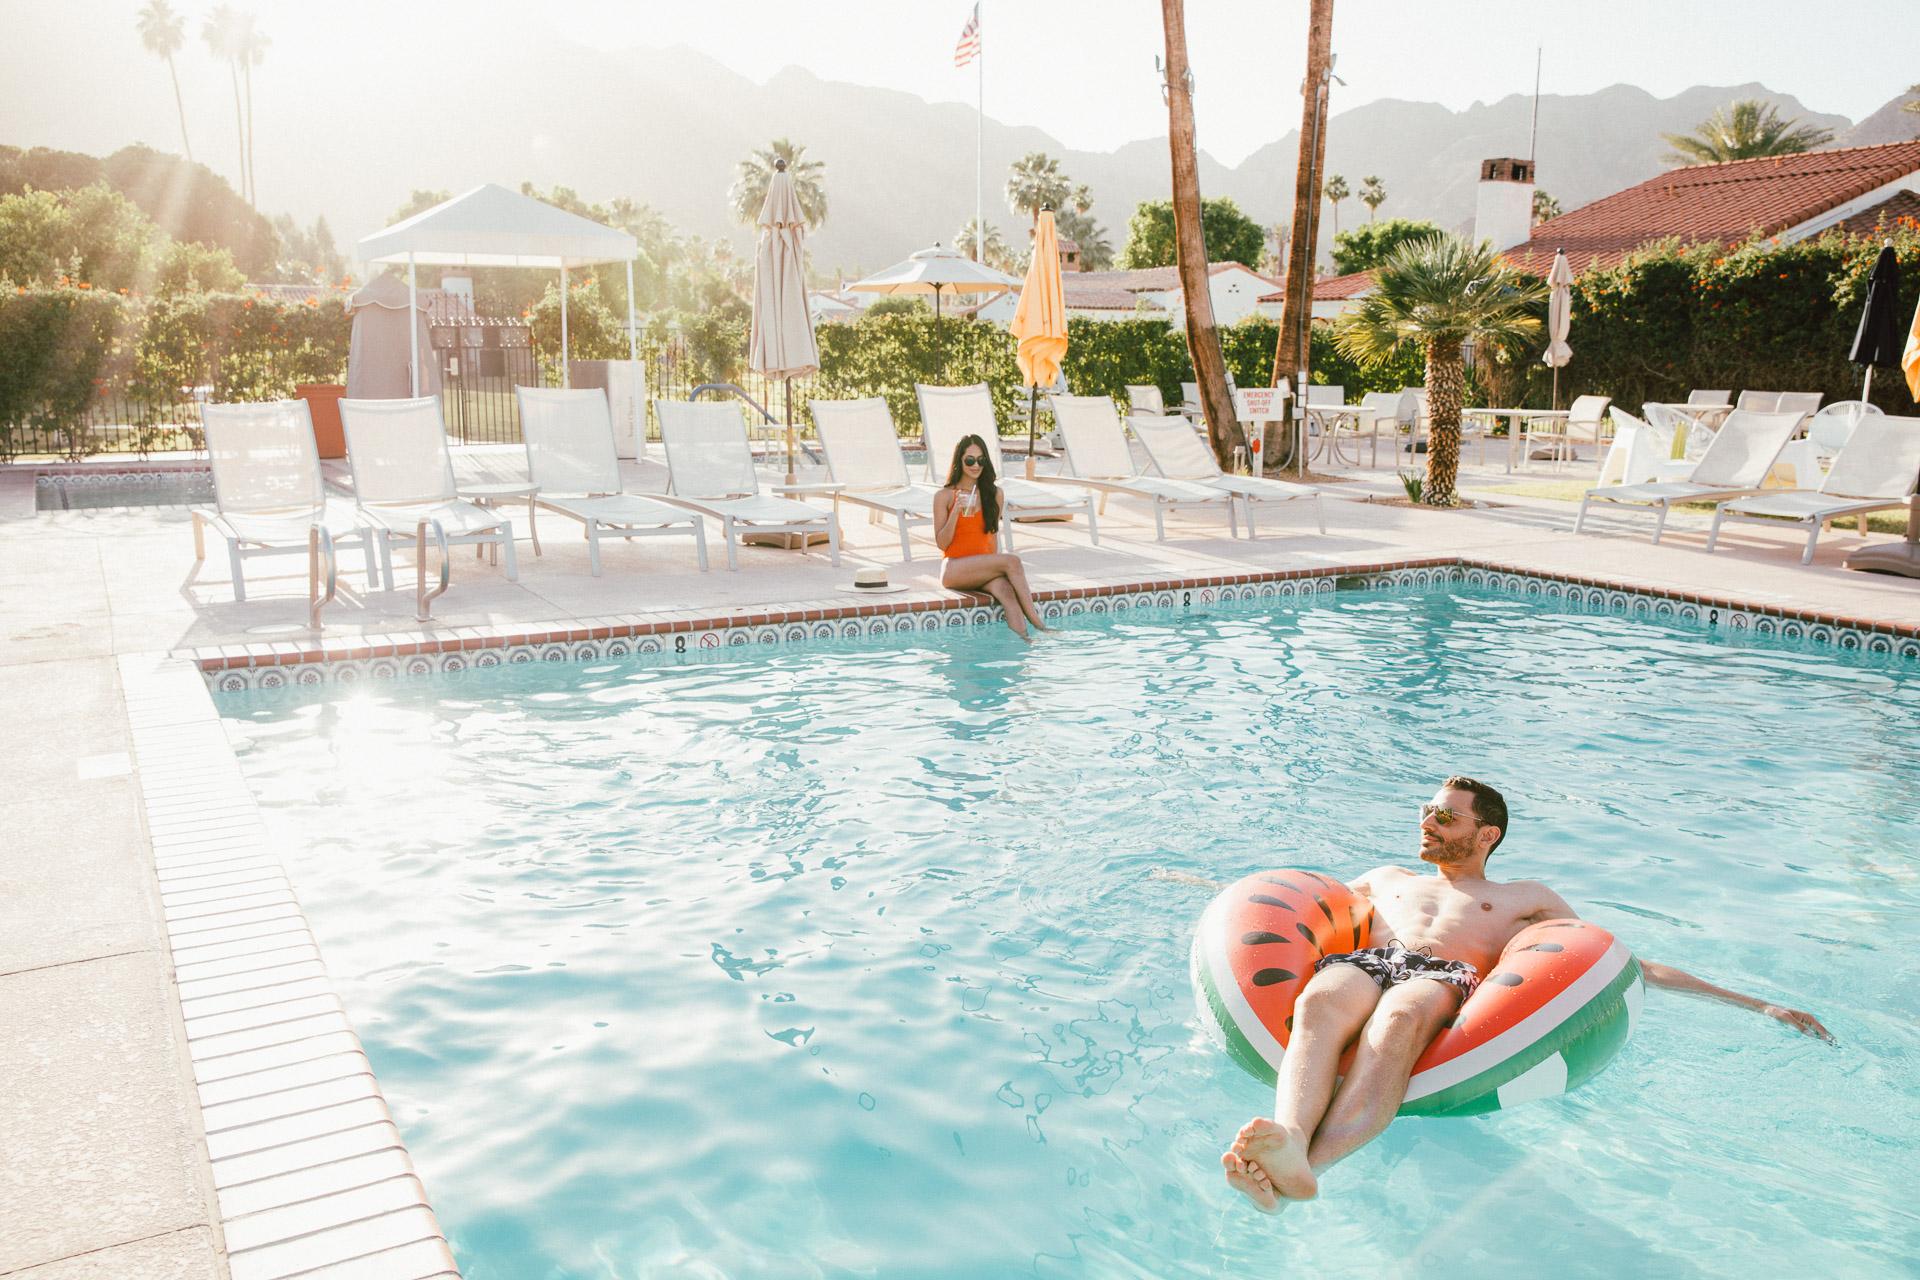 palm-springs-california-hotel-lifestyle-photographer-la-quinta-resort-club-30.jpg